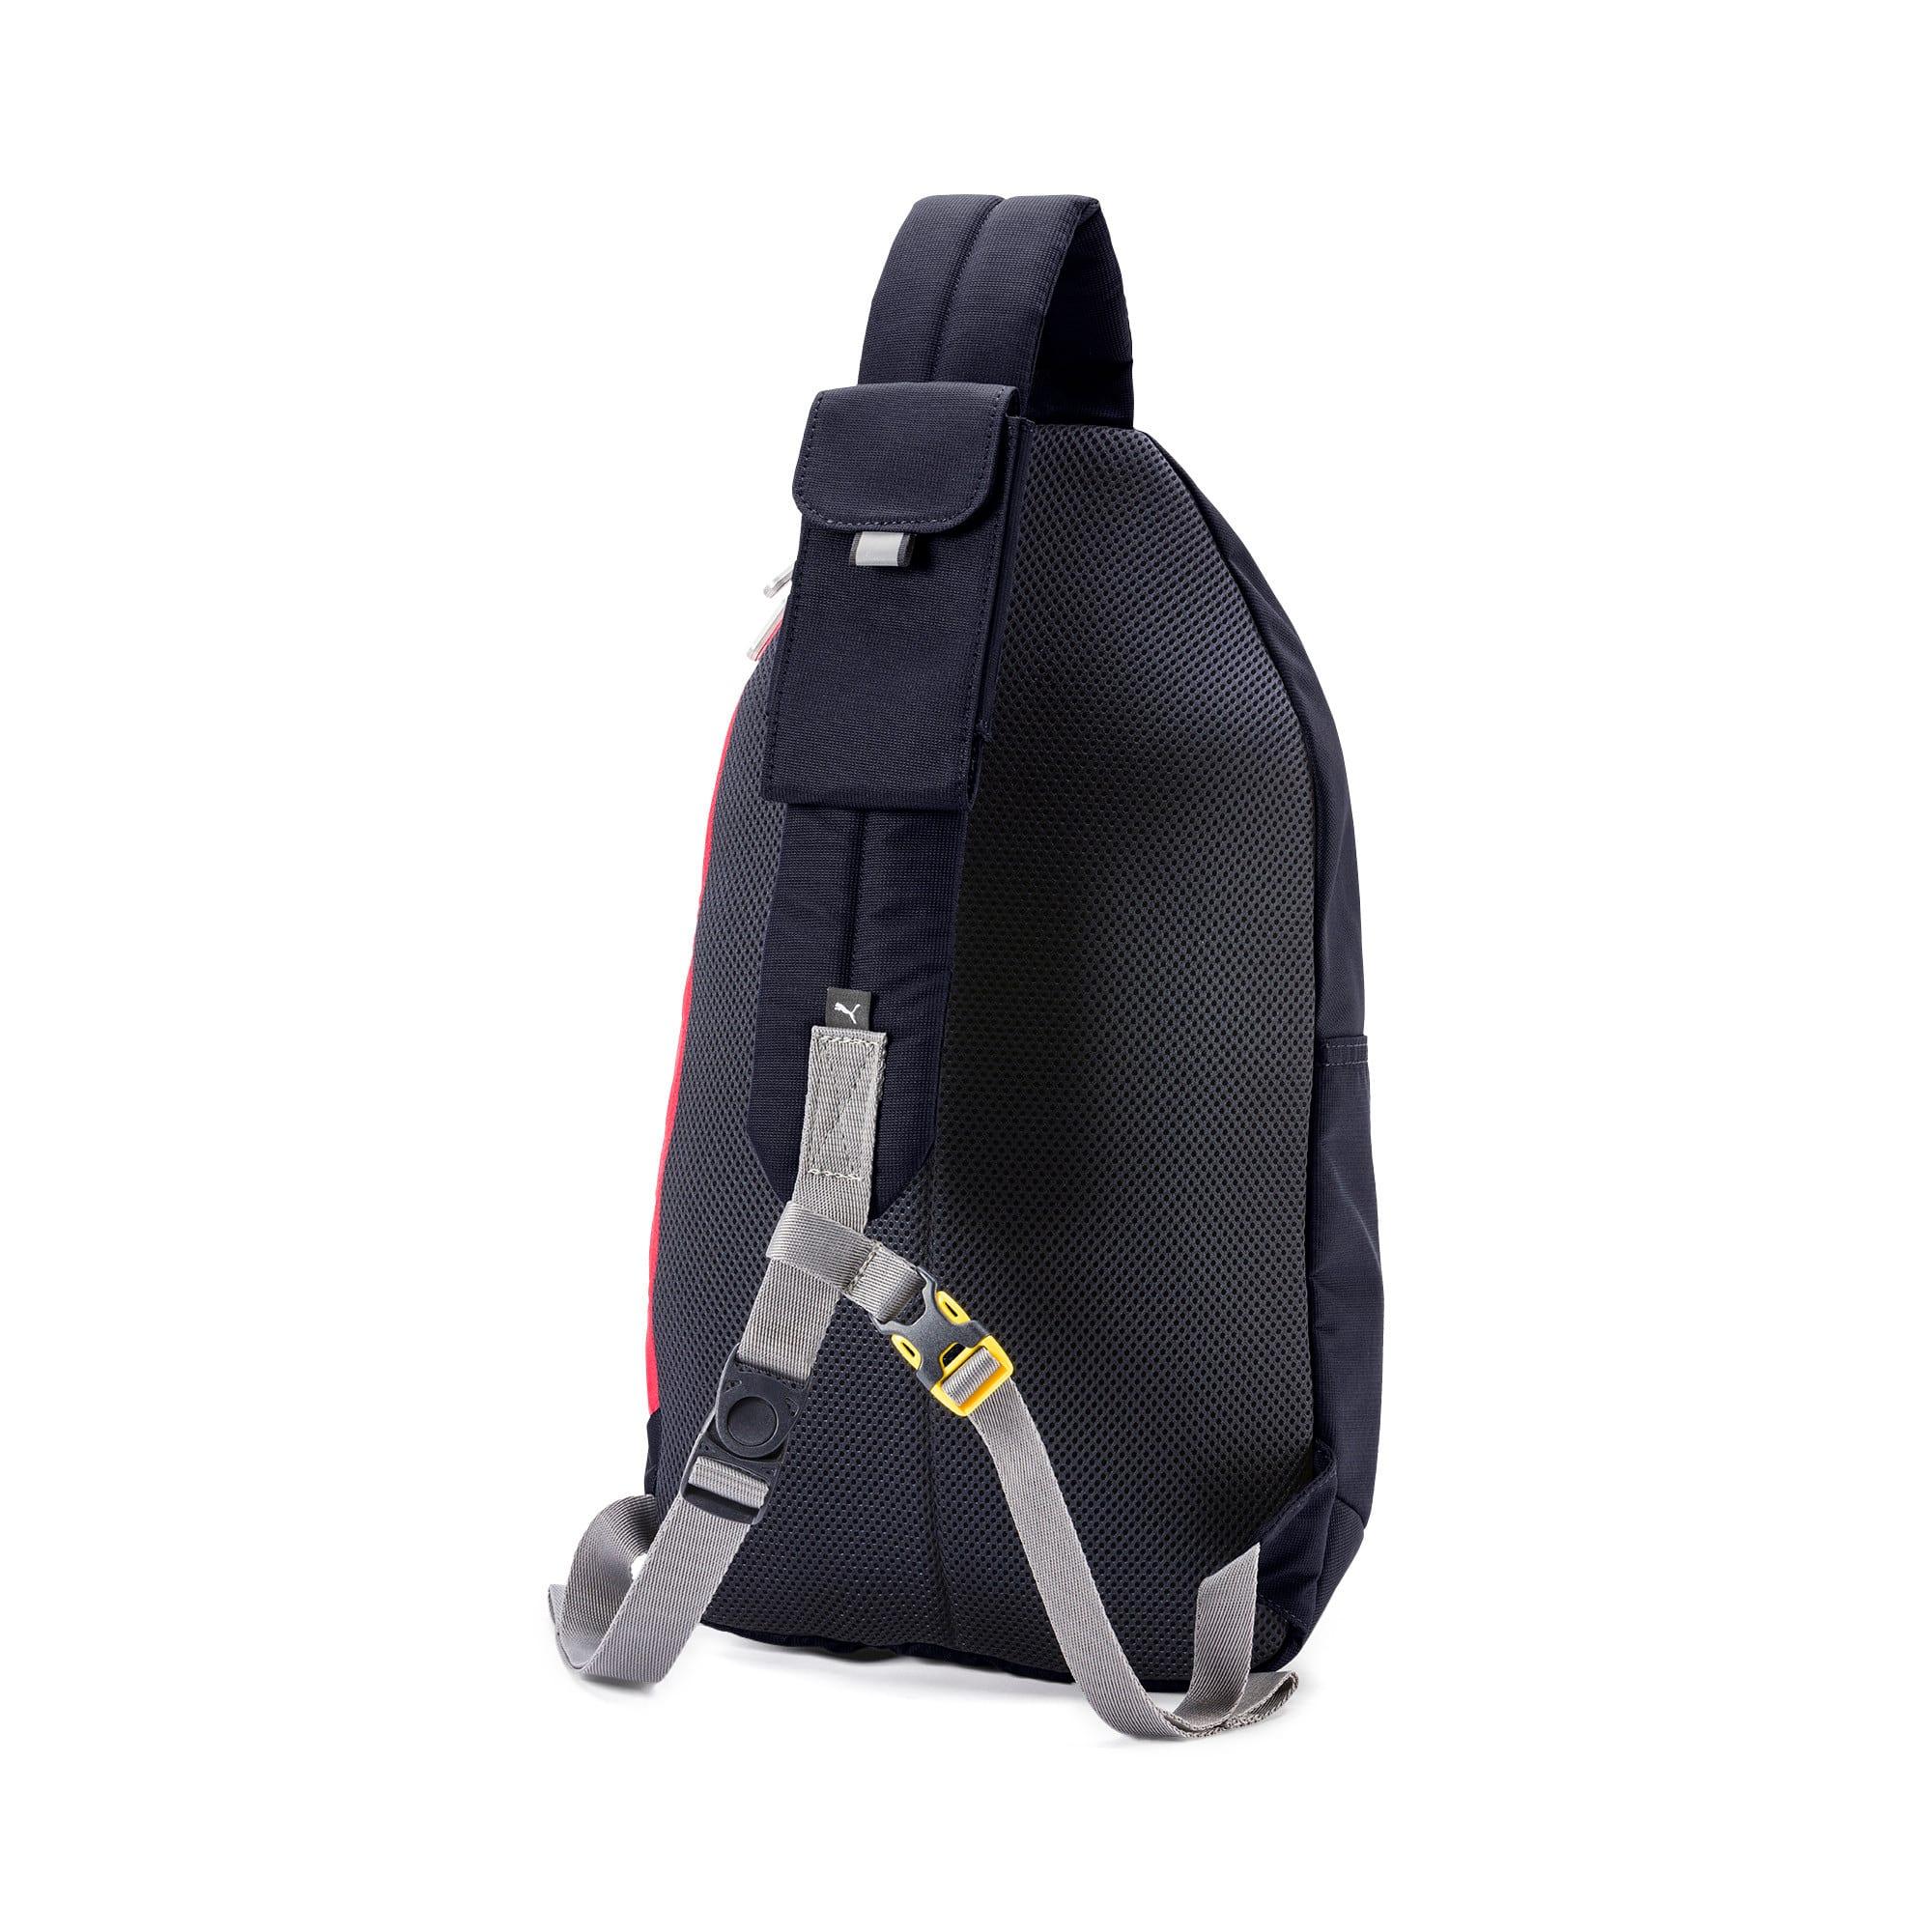 Thumbnail 2 of PUMA x RBR Lifestyle Sling Shoulder Bag, NIGHT SKY, medium